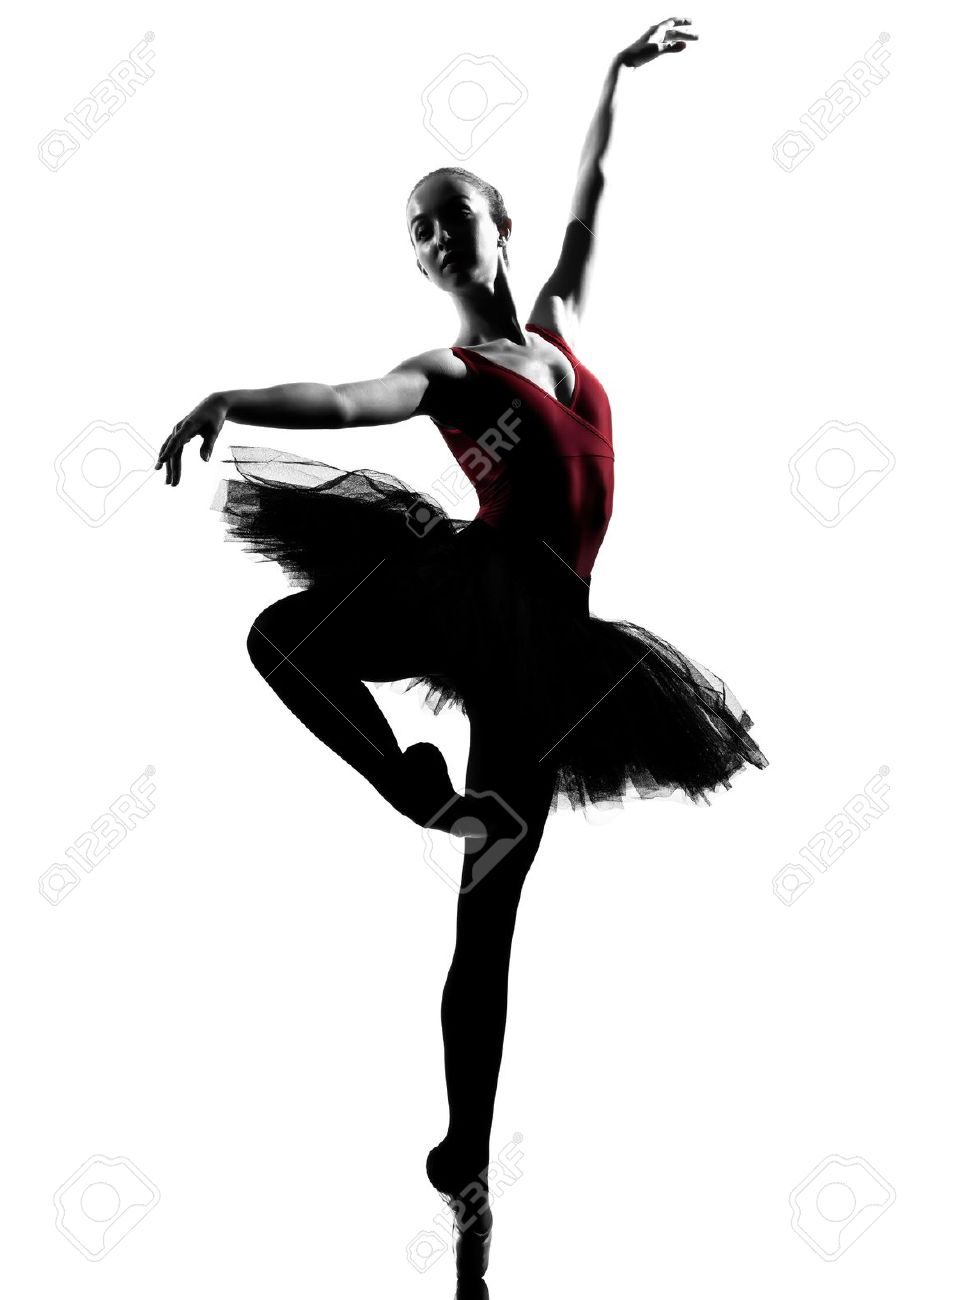 ballet dancer stock photos royalty free ballet dancer images and